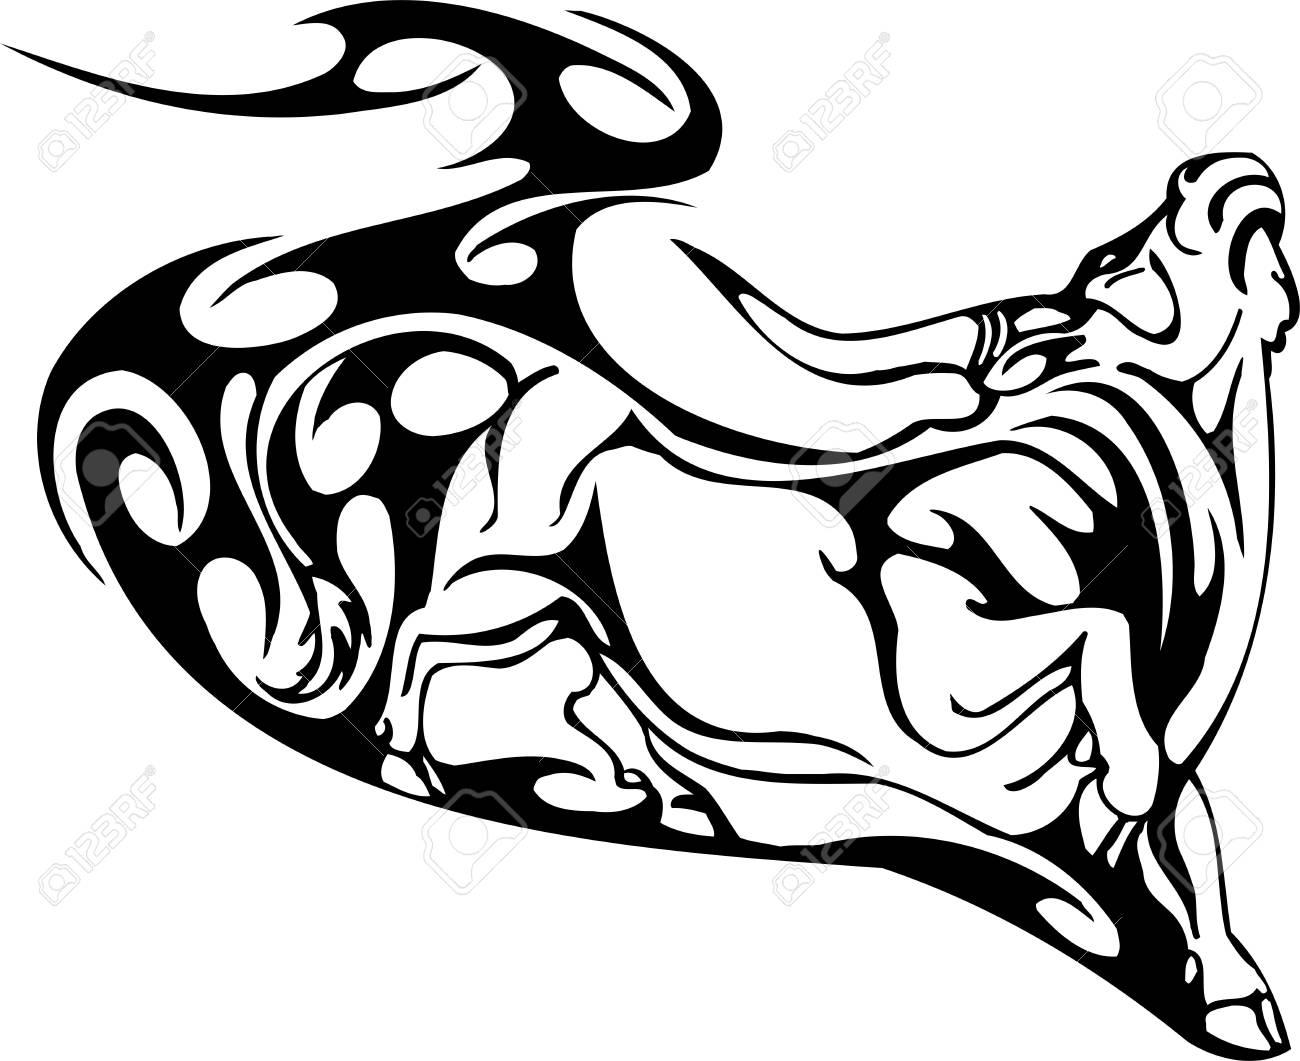 Bull in tribal style - vector image. Stock Vector - 12490426